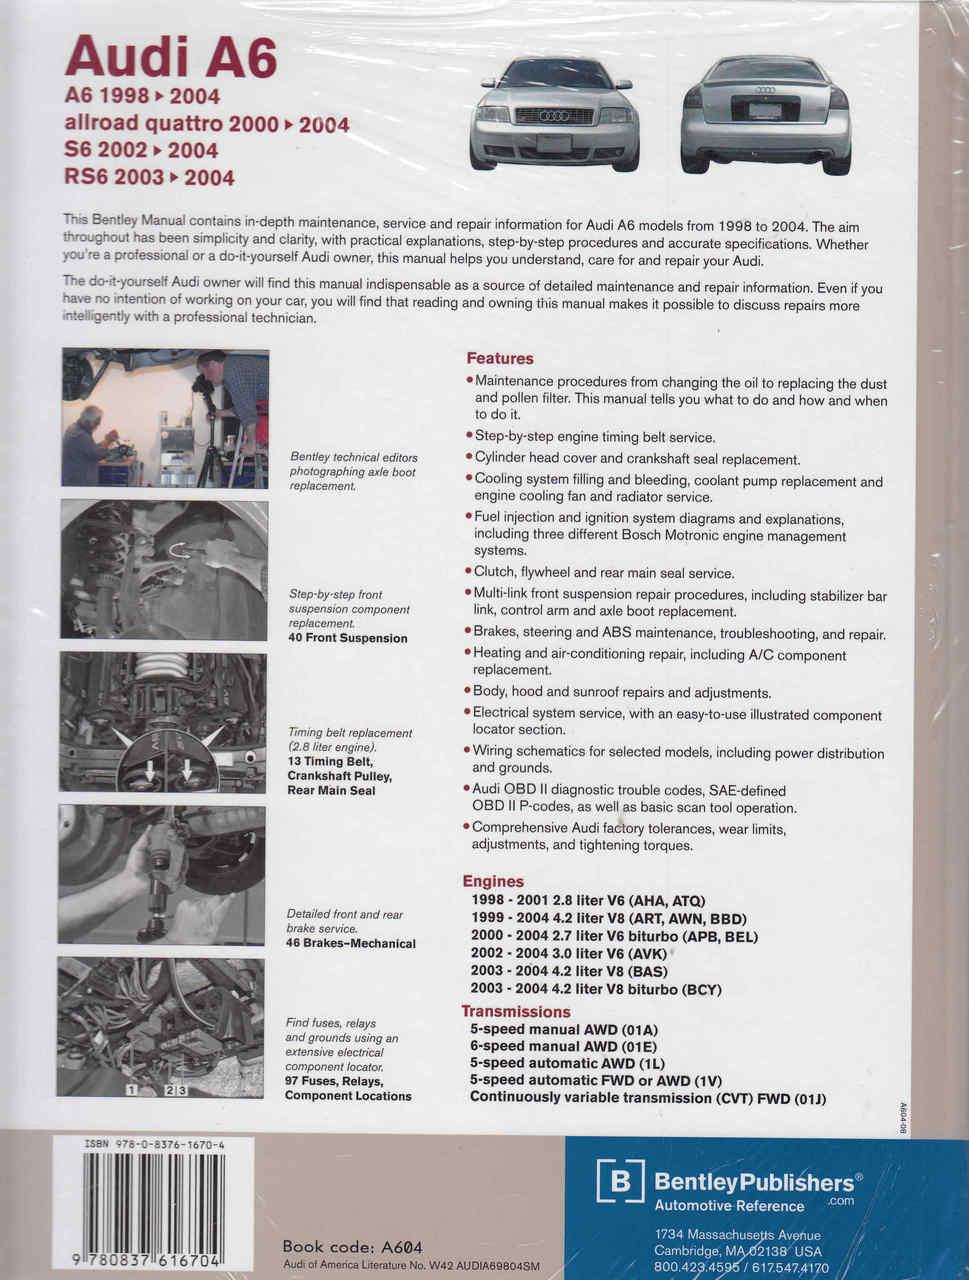 Audi A6, S6, Allroad Quattro, RS6 1998 - 2004 Service Manual